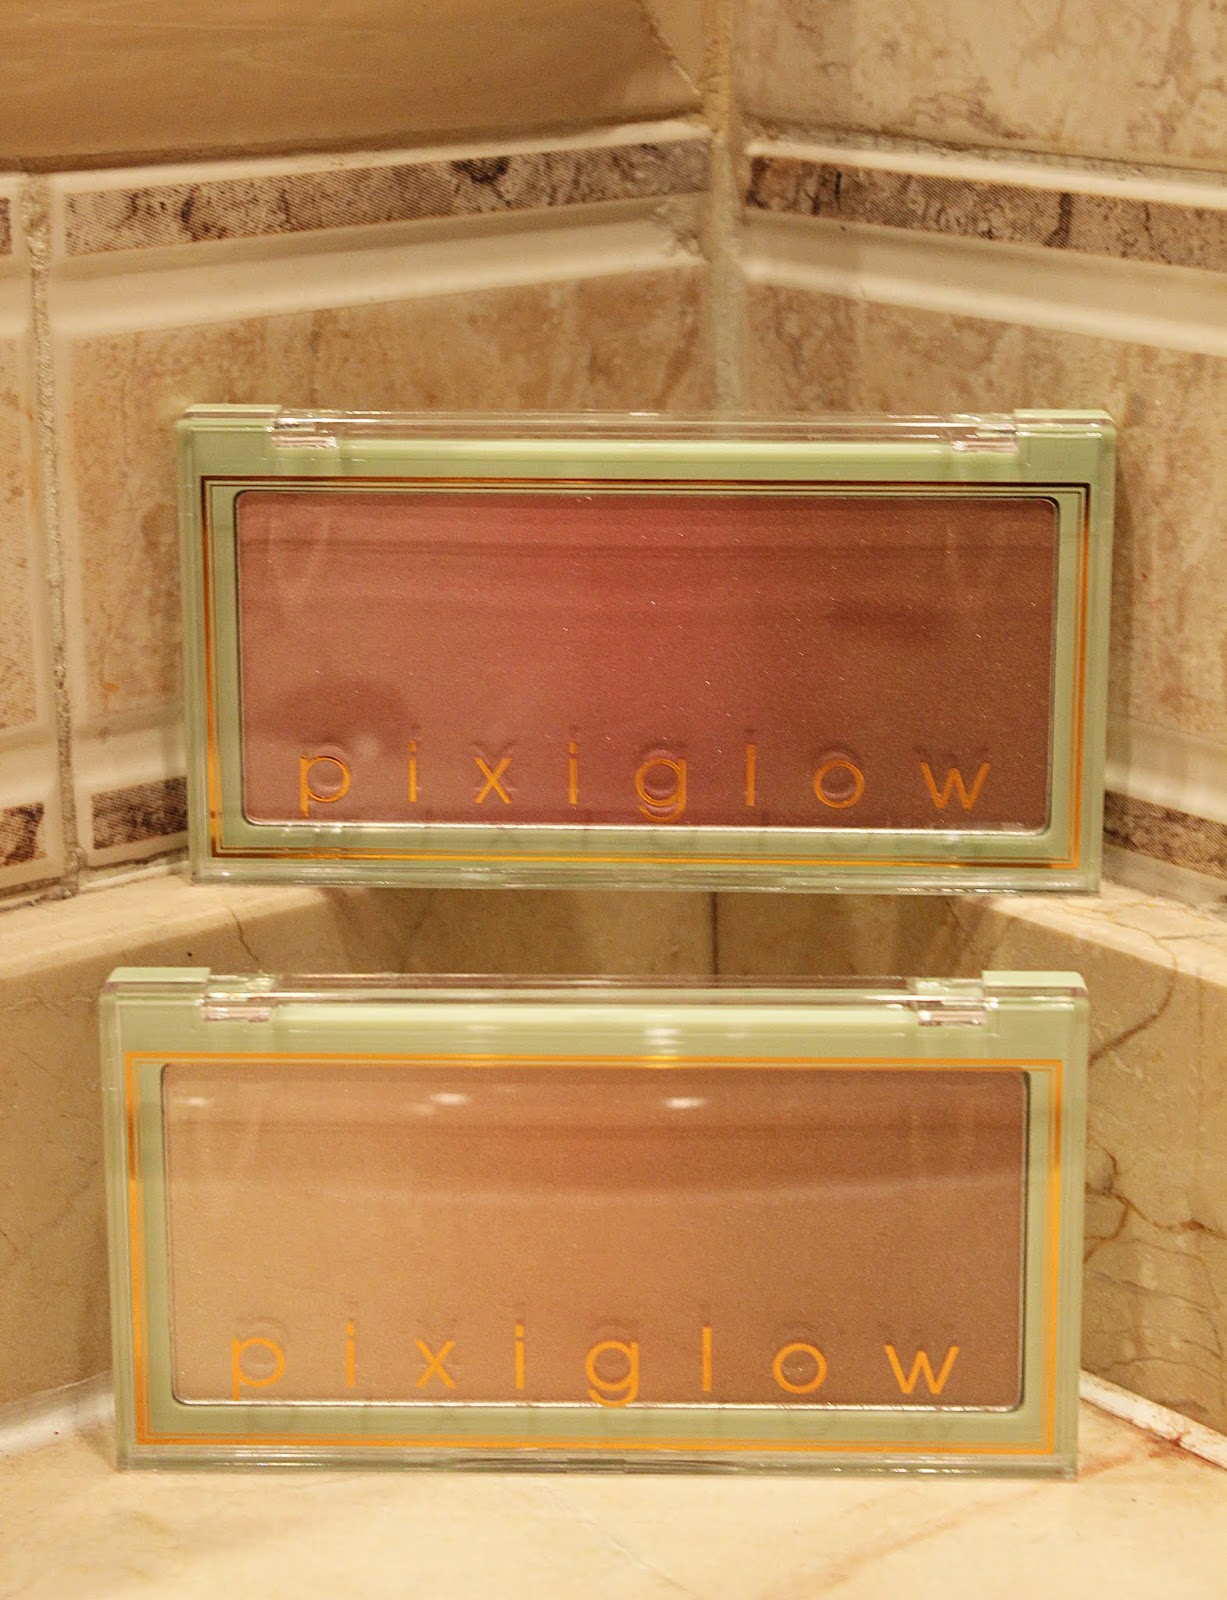 Pixi-Beauty-venta-Sephora-productos-belleza